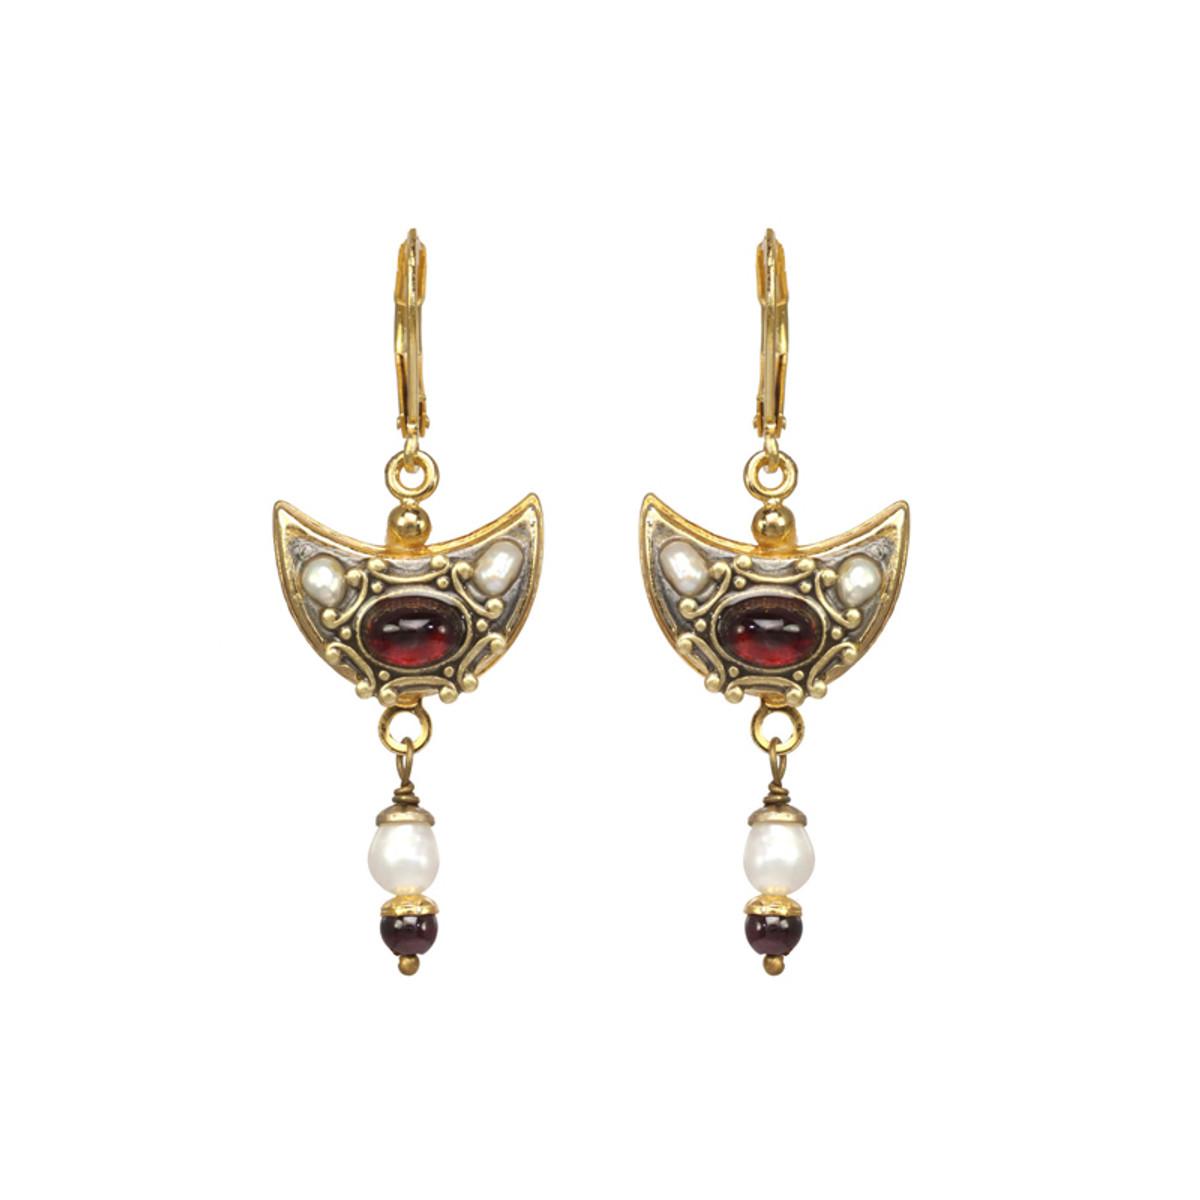 Michal Golan Victorian Crescent Earrings